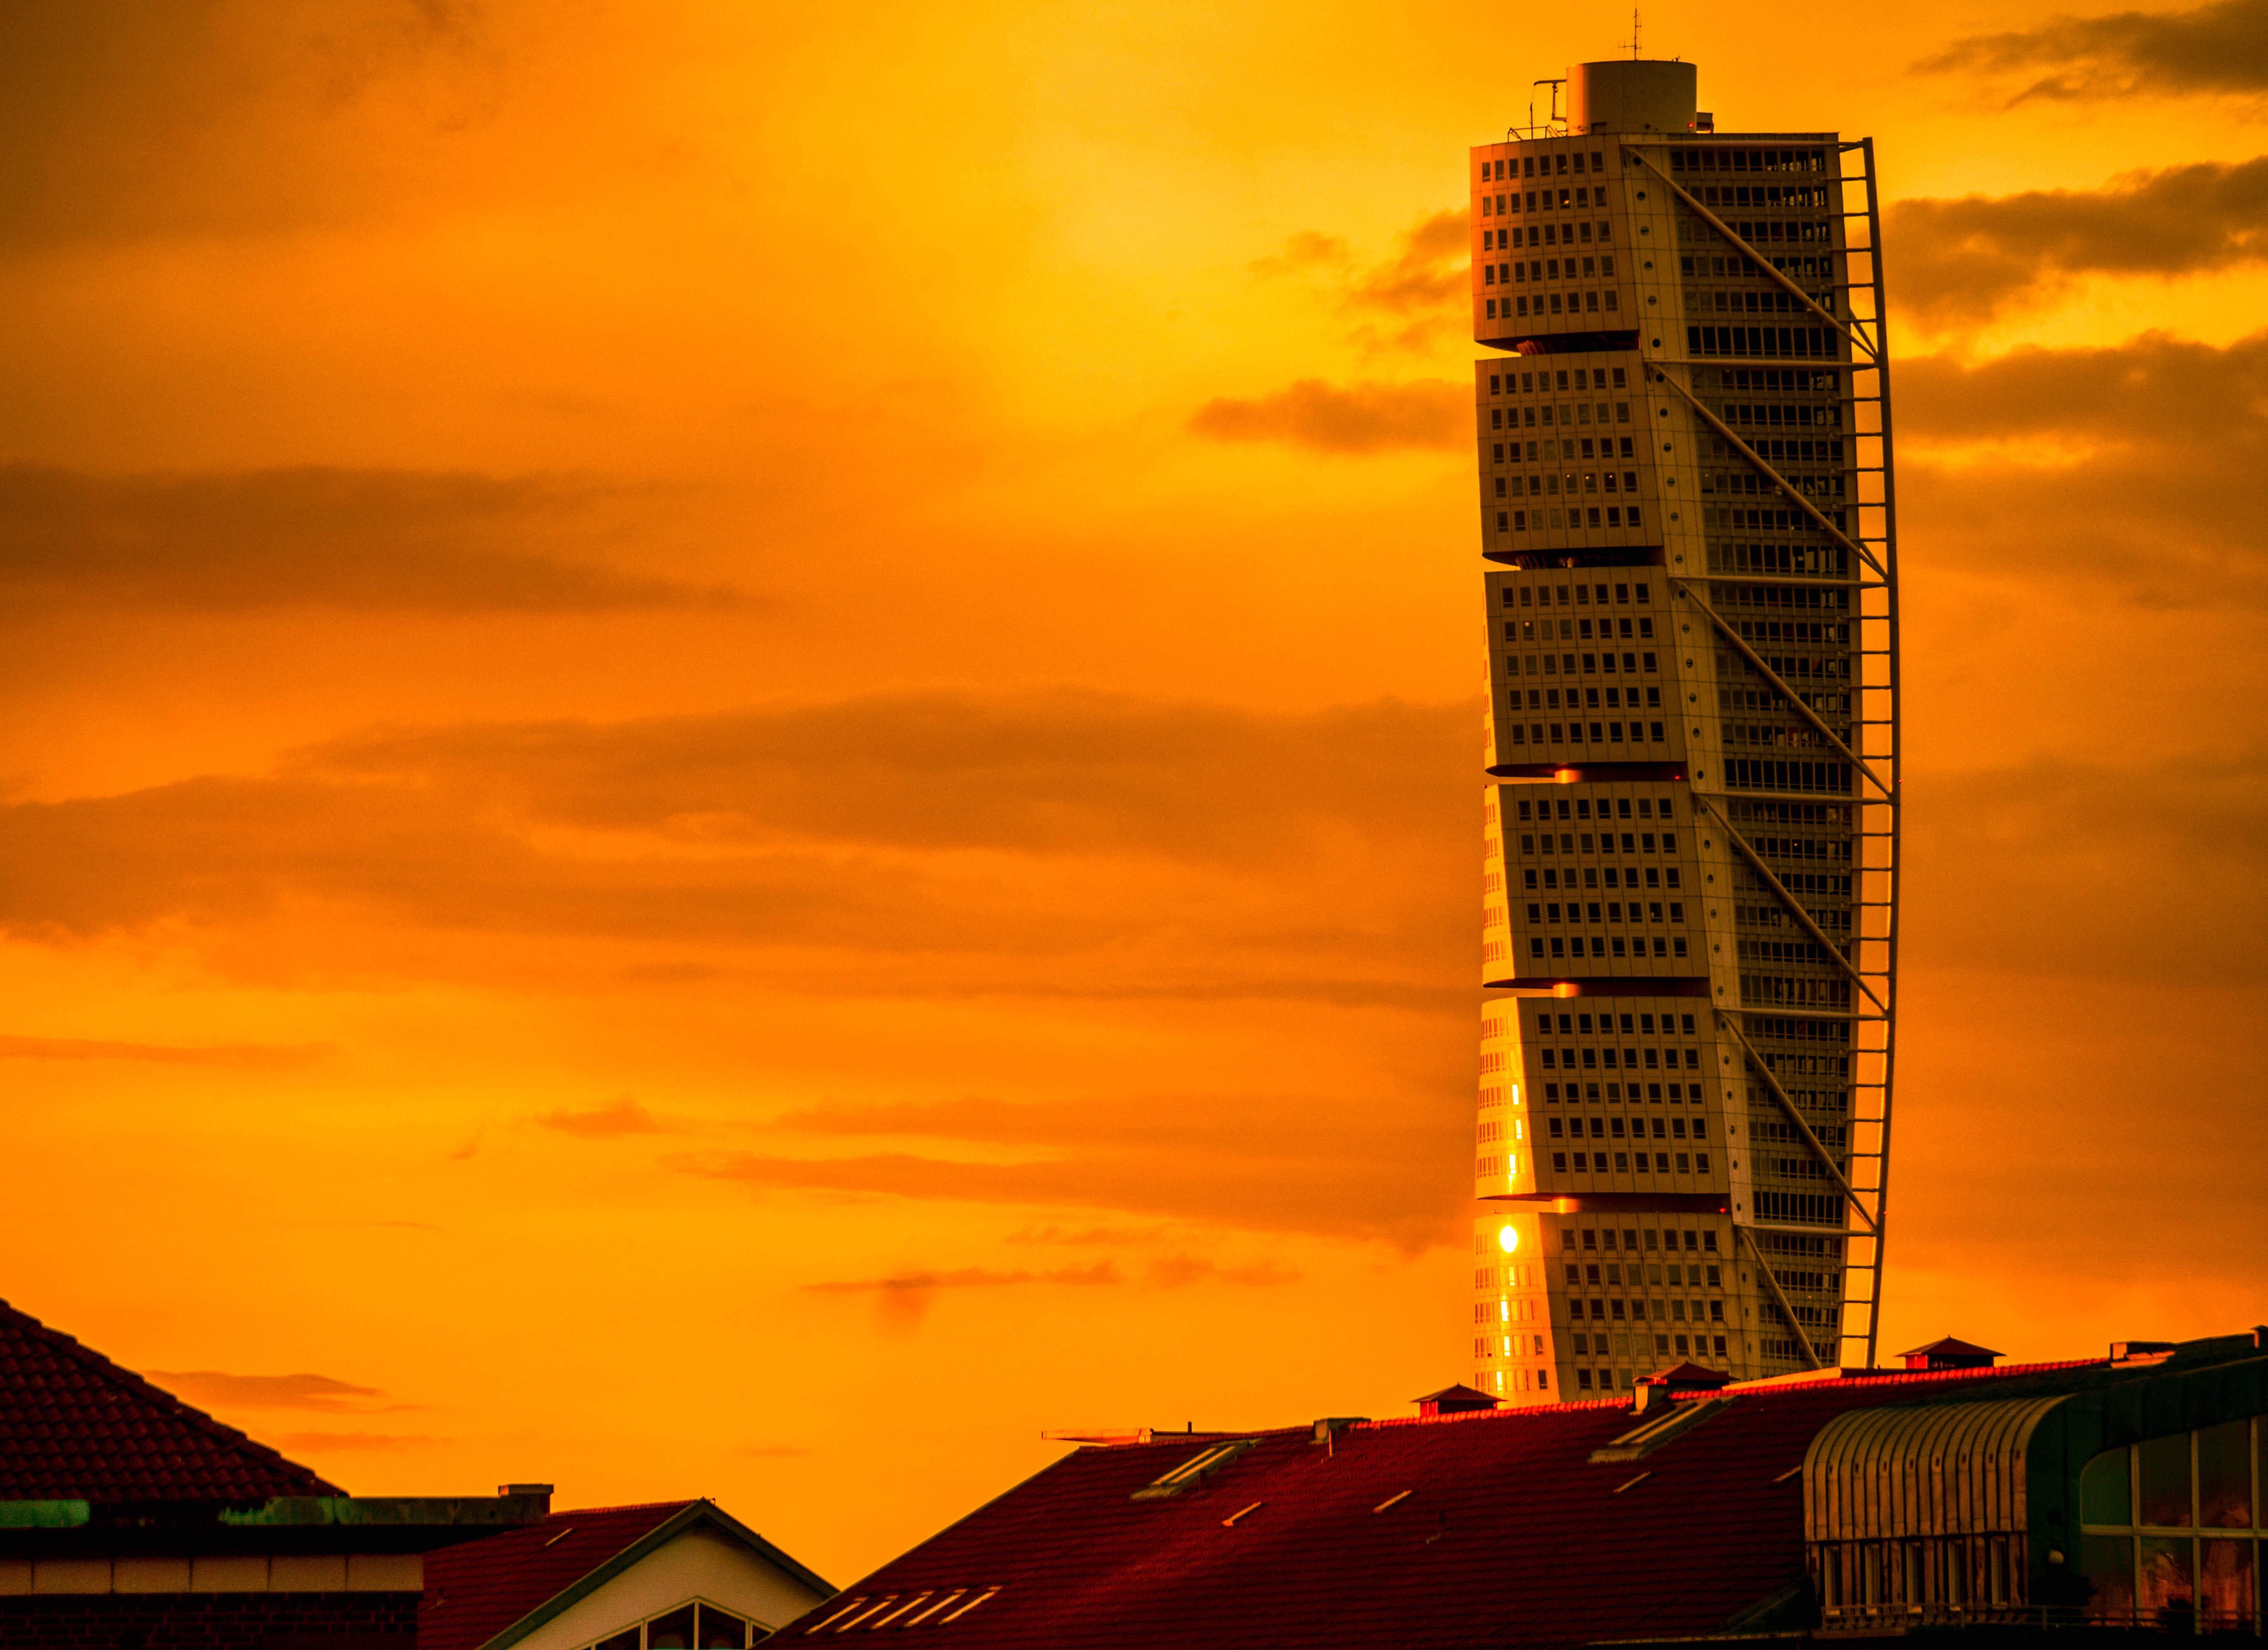 Wallpaper : sunlight, sunset, city, cityscape, night ...